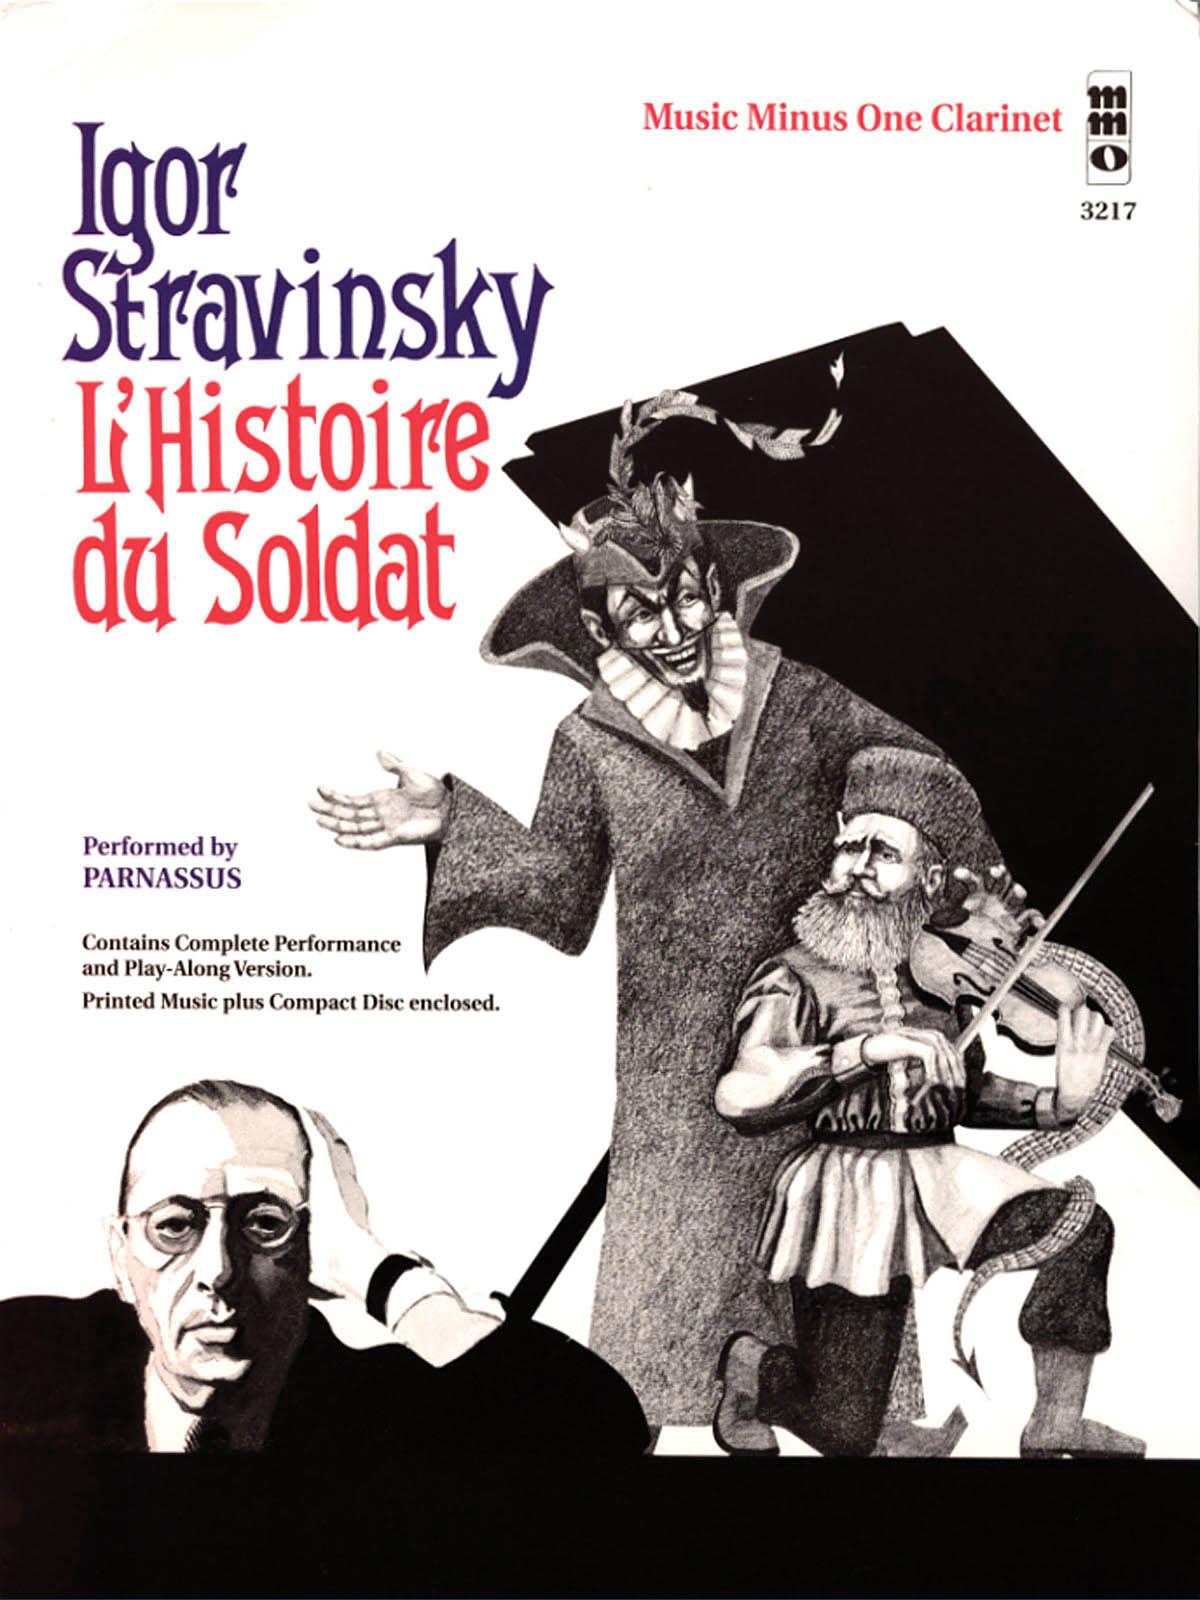 Igor Stravinsky: Igor Stravinsky - L'histoire du Soldat: Clarinet Solo: